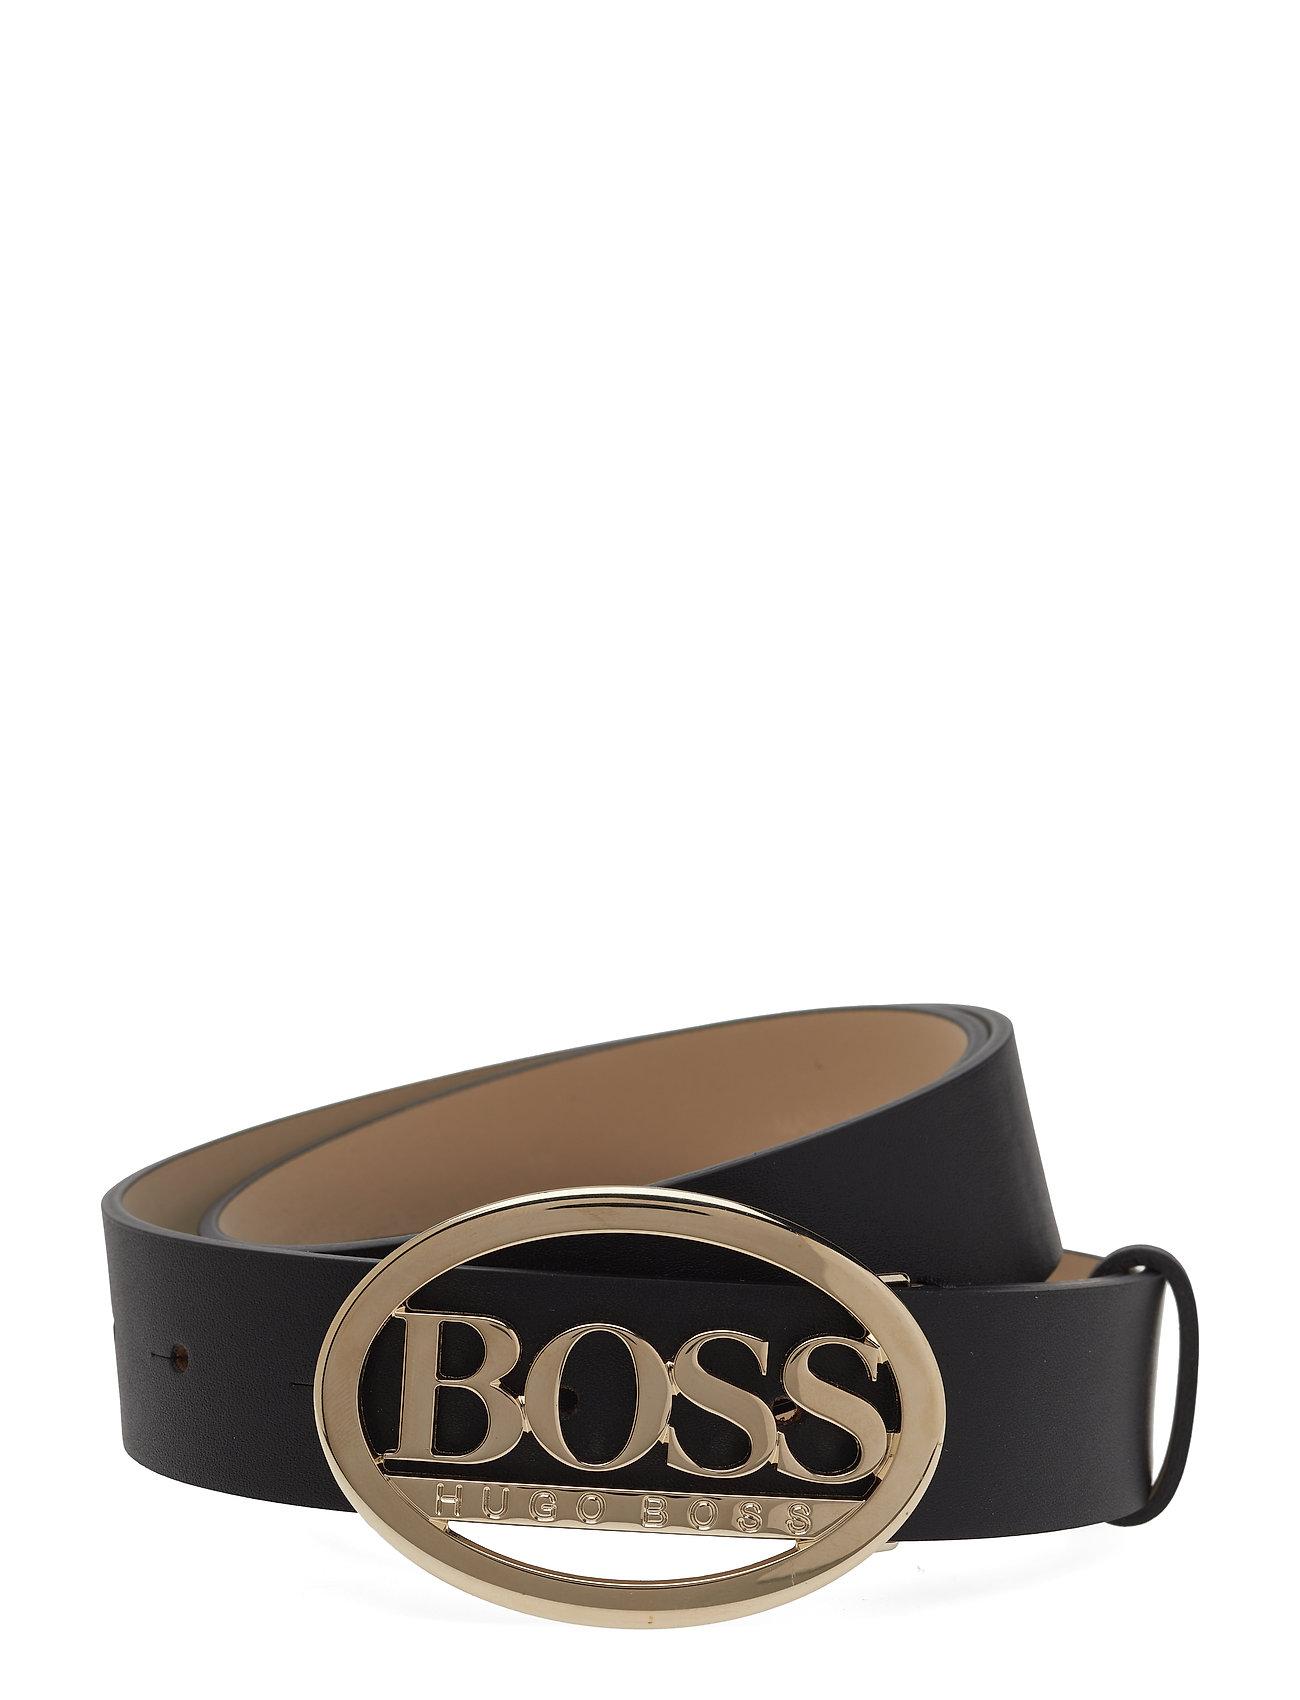 HUGO BOSS Boss Belt 3 Cm-Gz Gürtel Braun BOSS BUSINESS WEAR